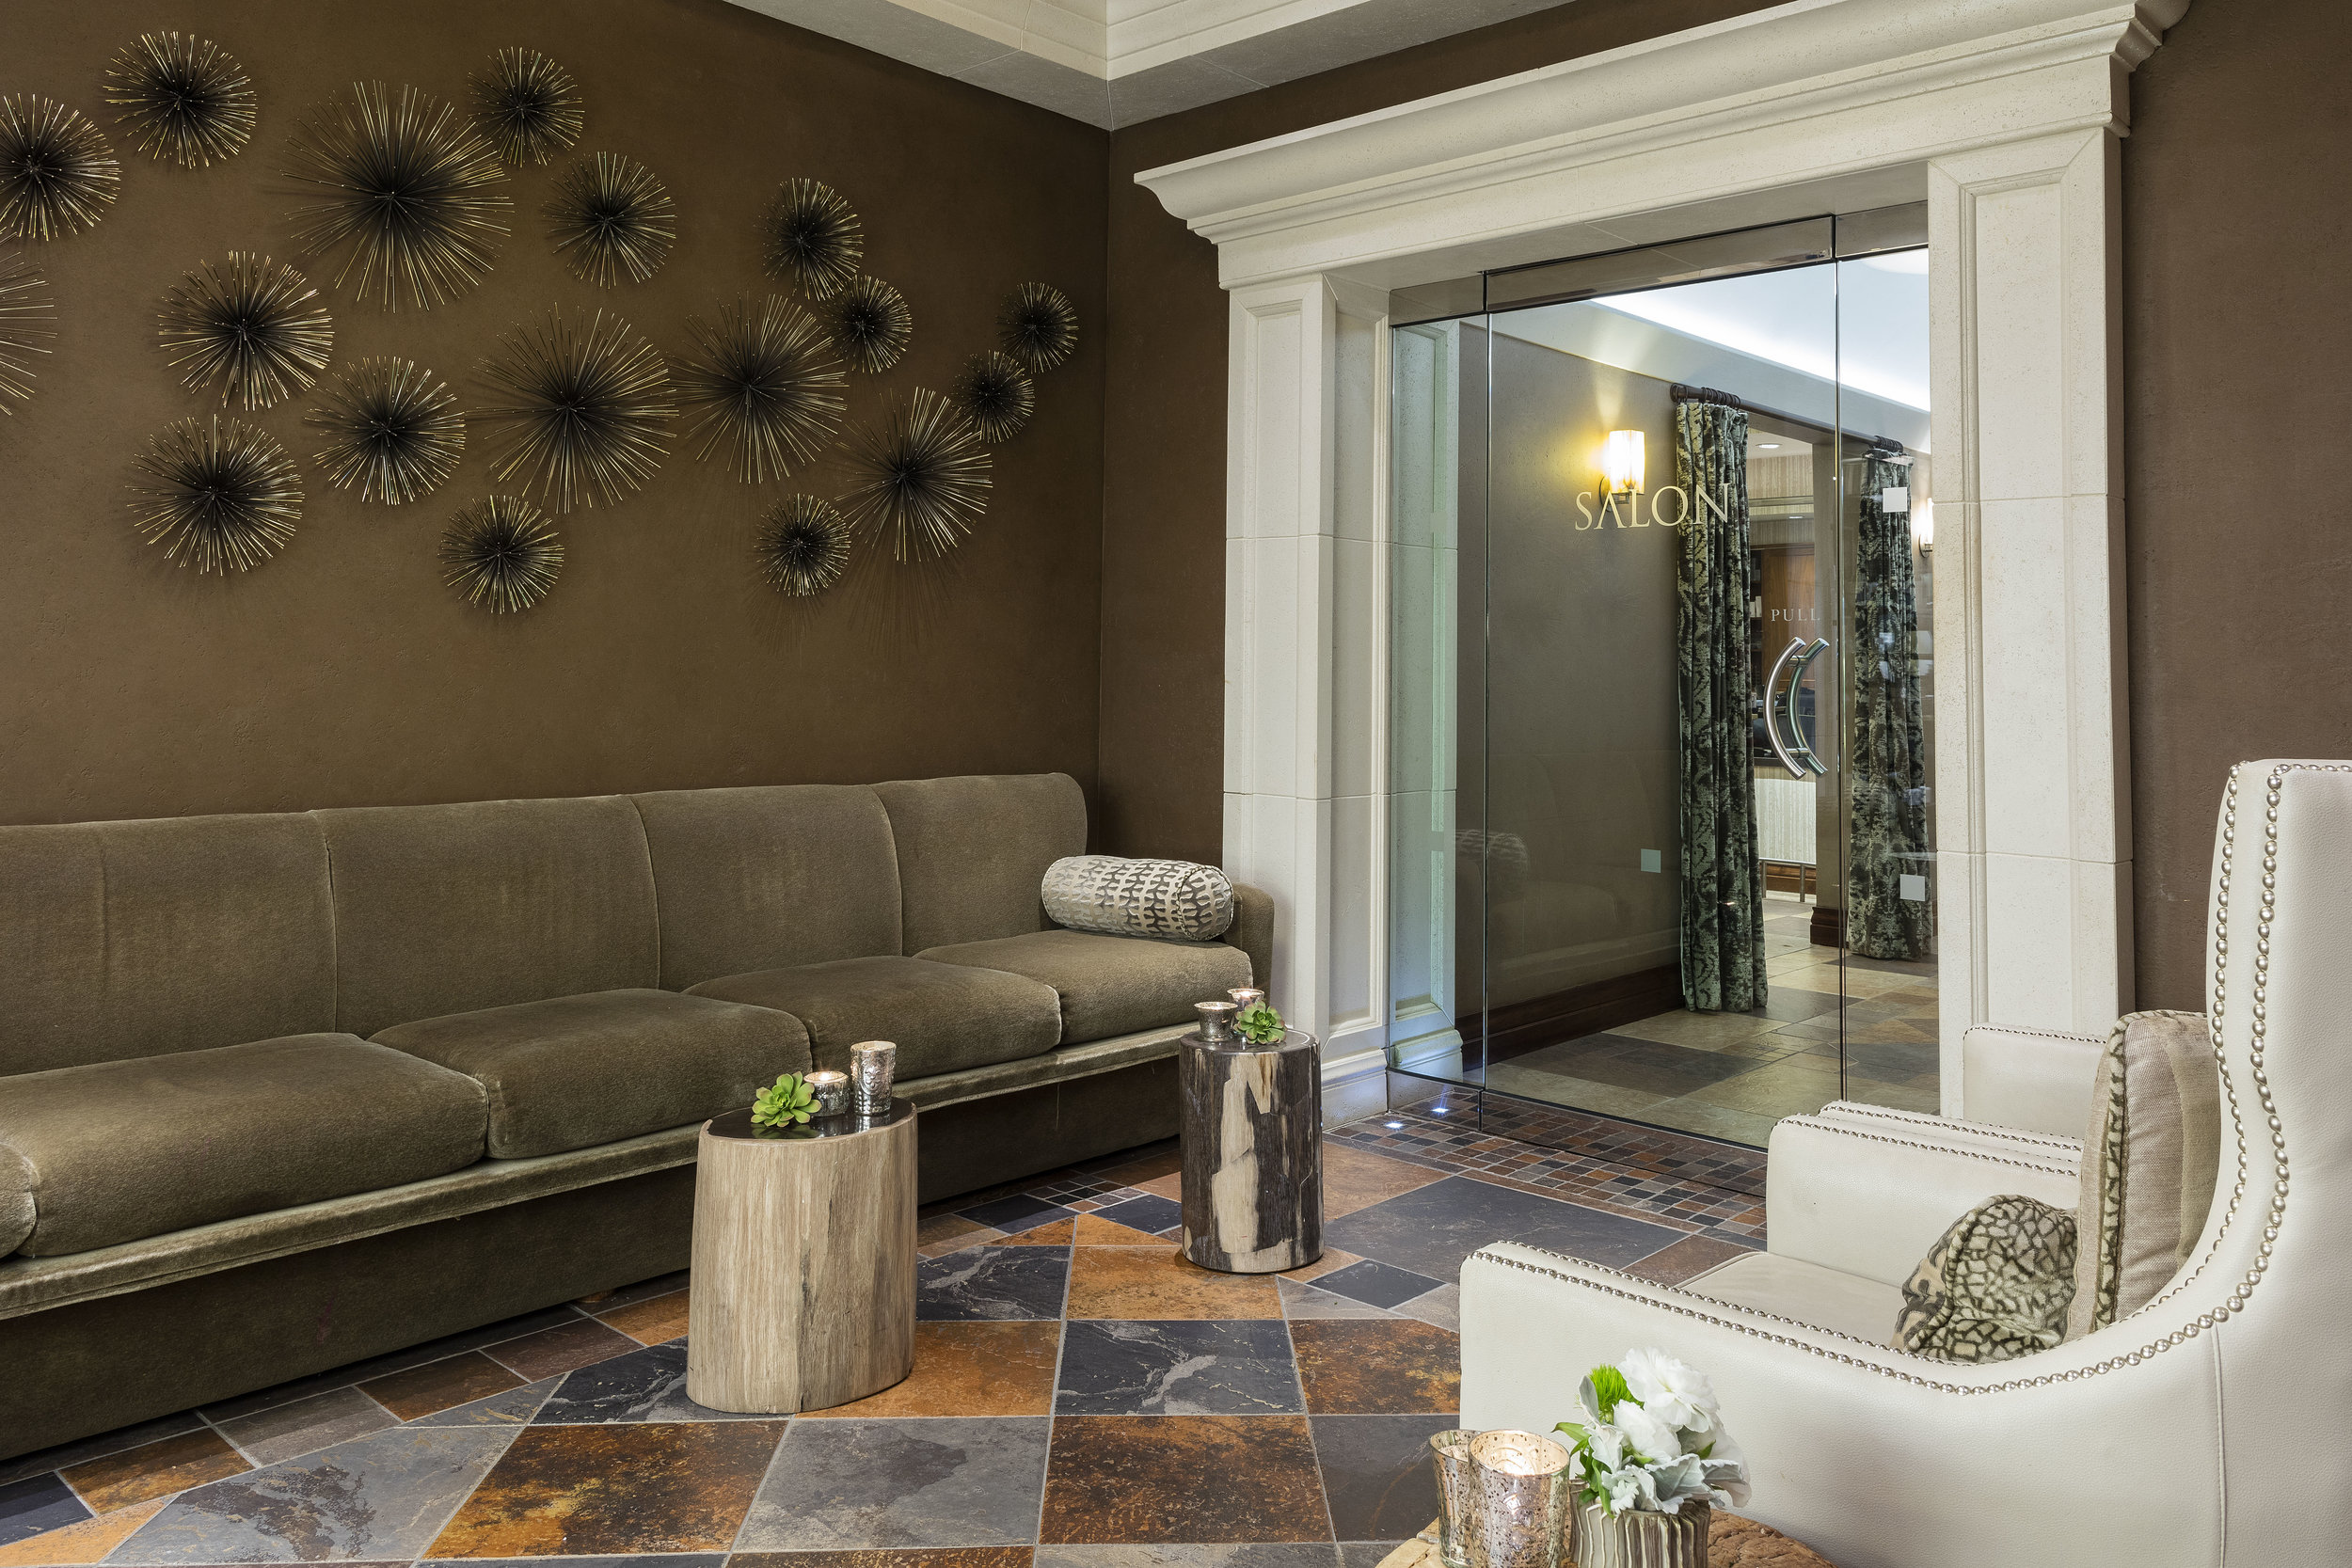 Salon Entrance & Waiting Area